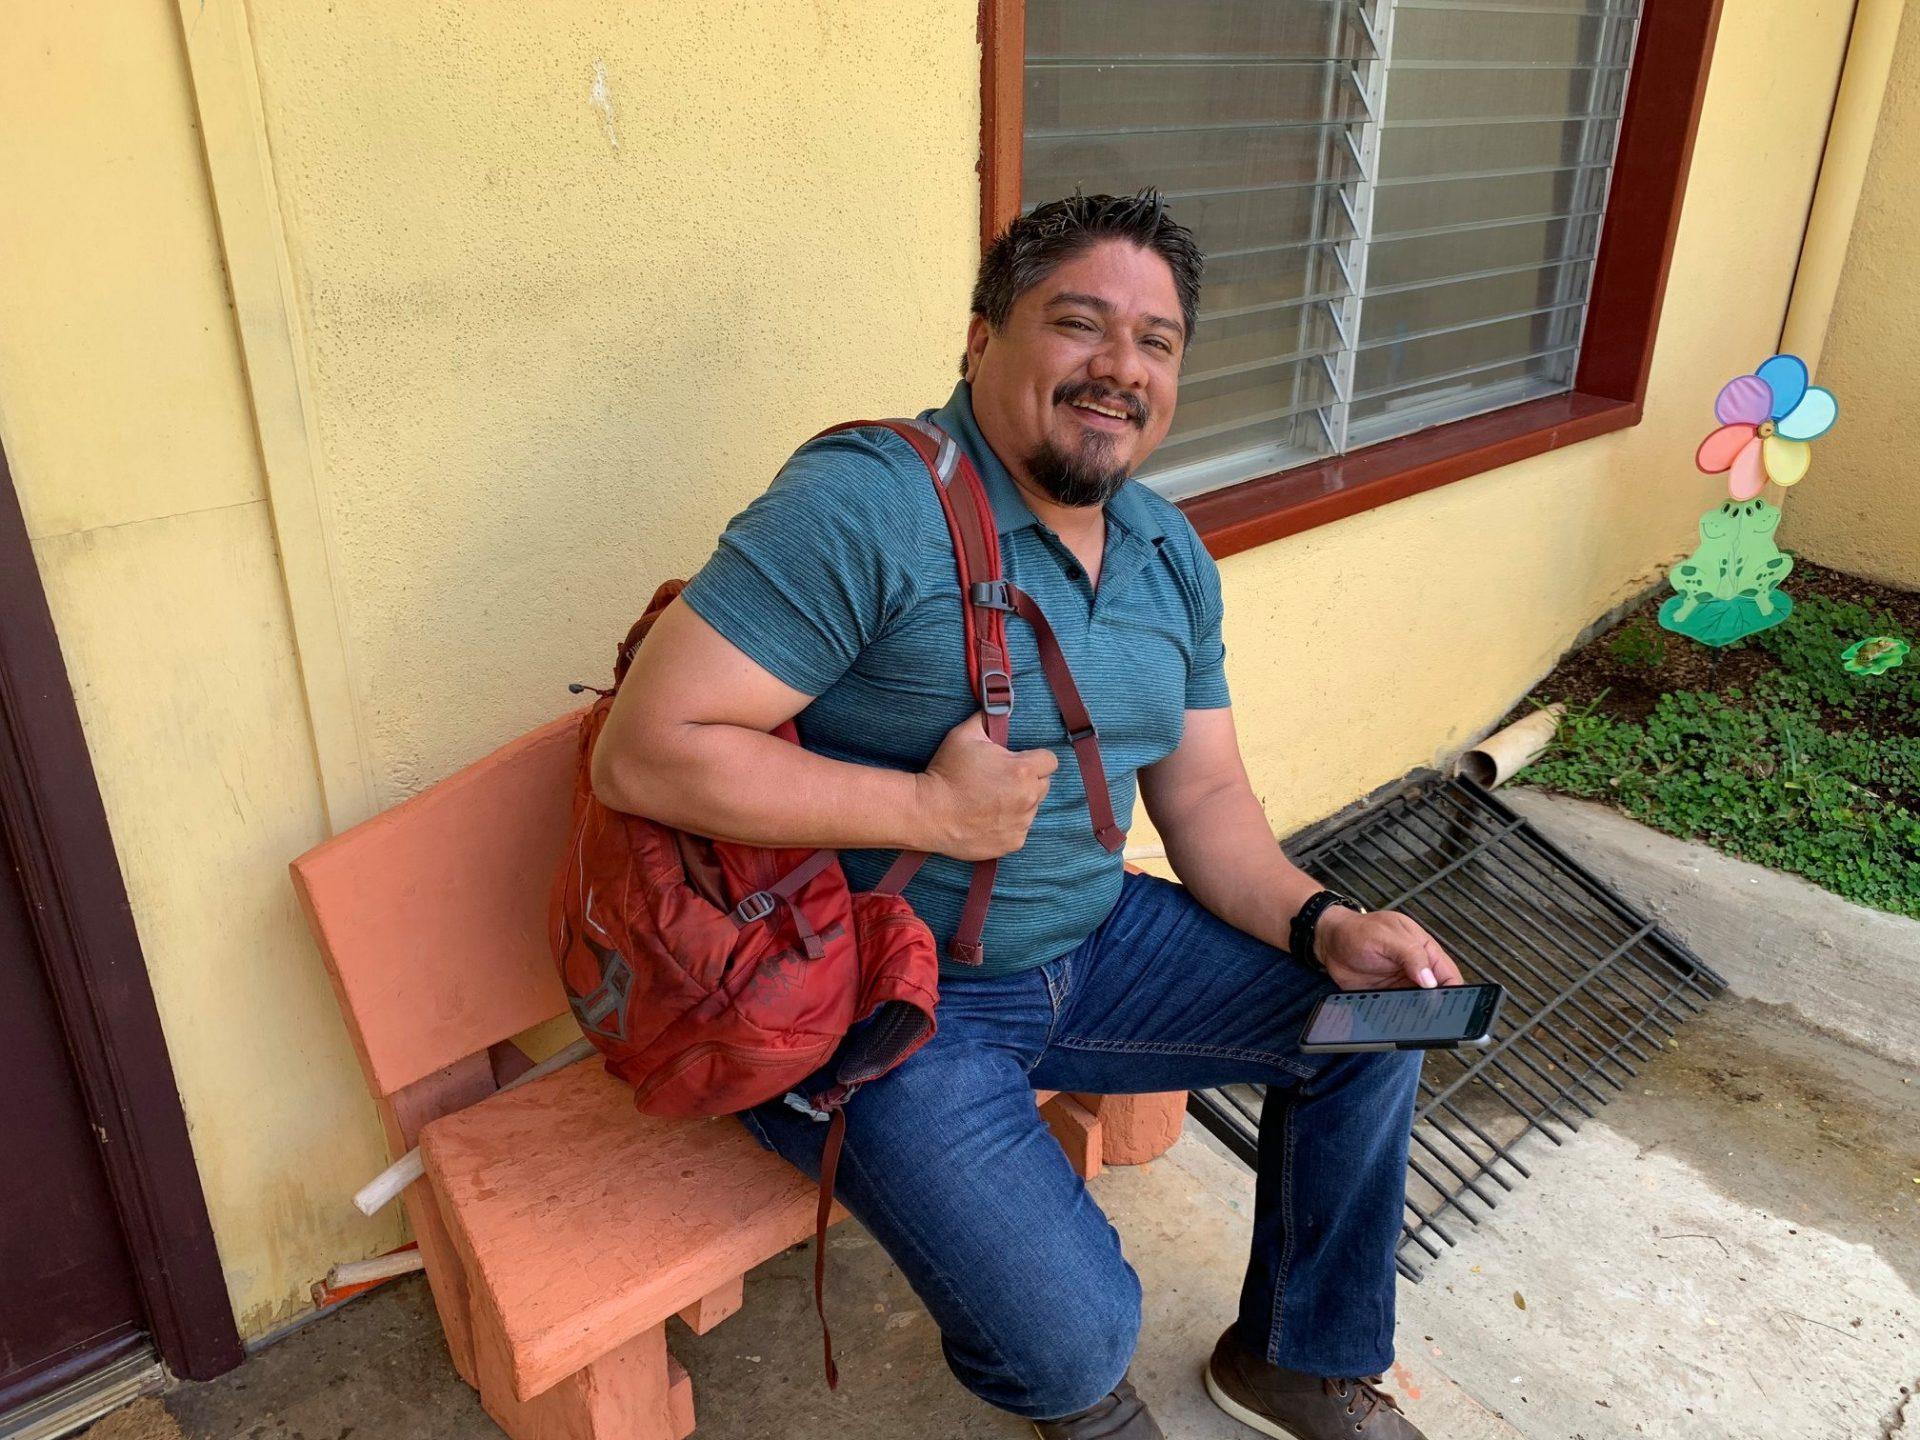 Junior Obregon, Campus Crusade, Nicaragua